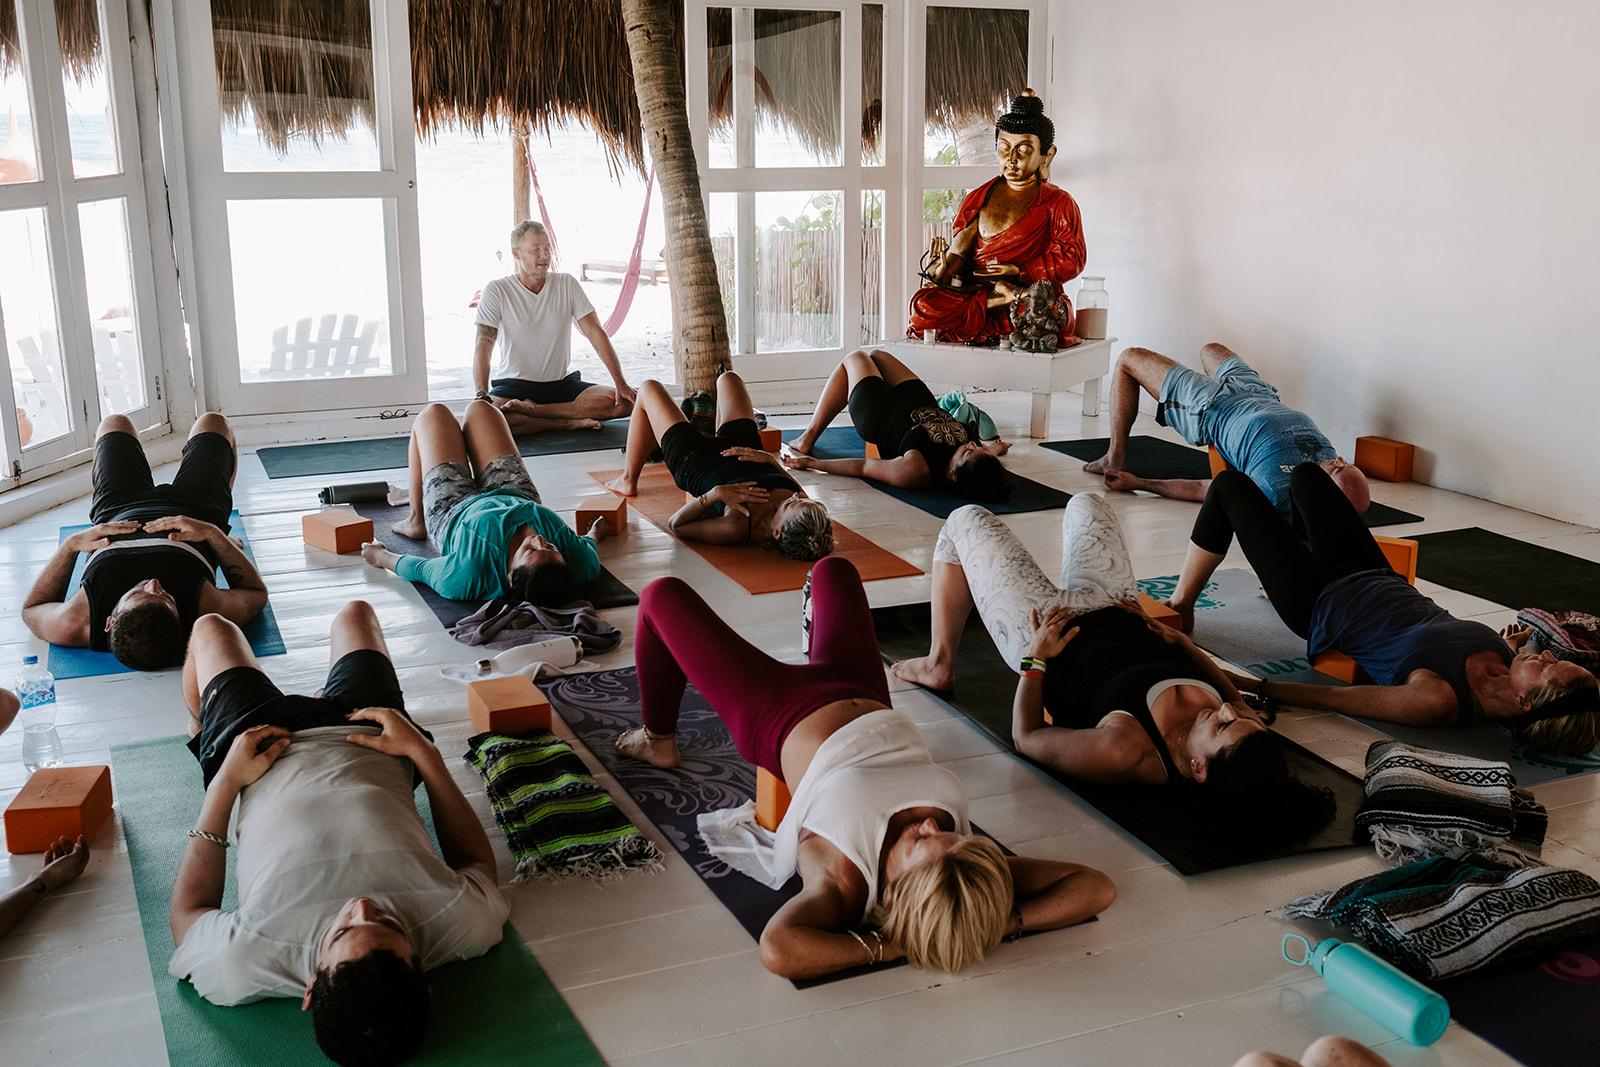 190311_Tulum Yoga Retreat _0284.jpg